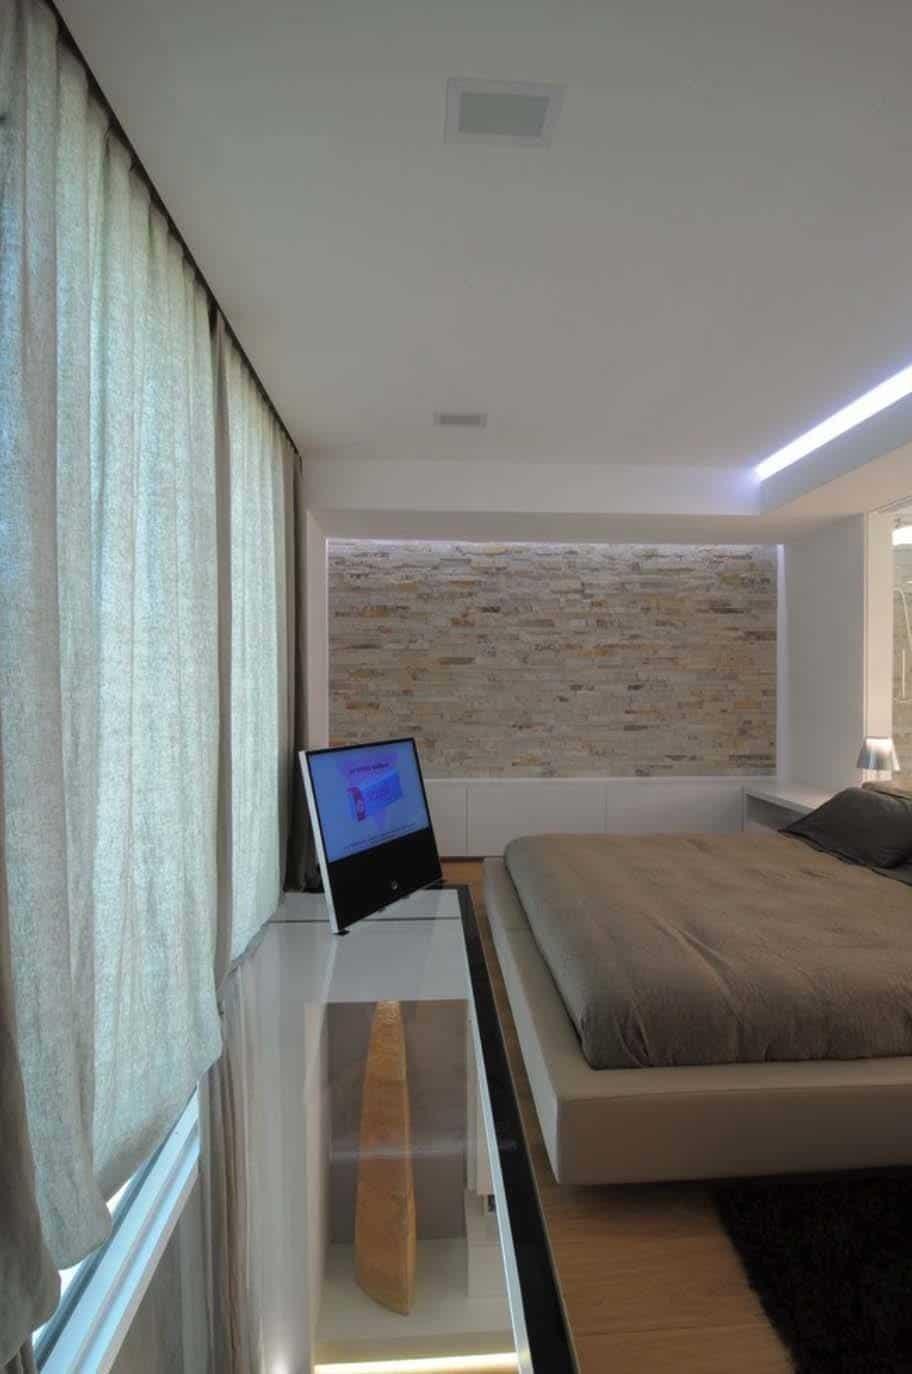 Luxury Home Interior-STIMAMIGLIO-21-1 Kindesign